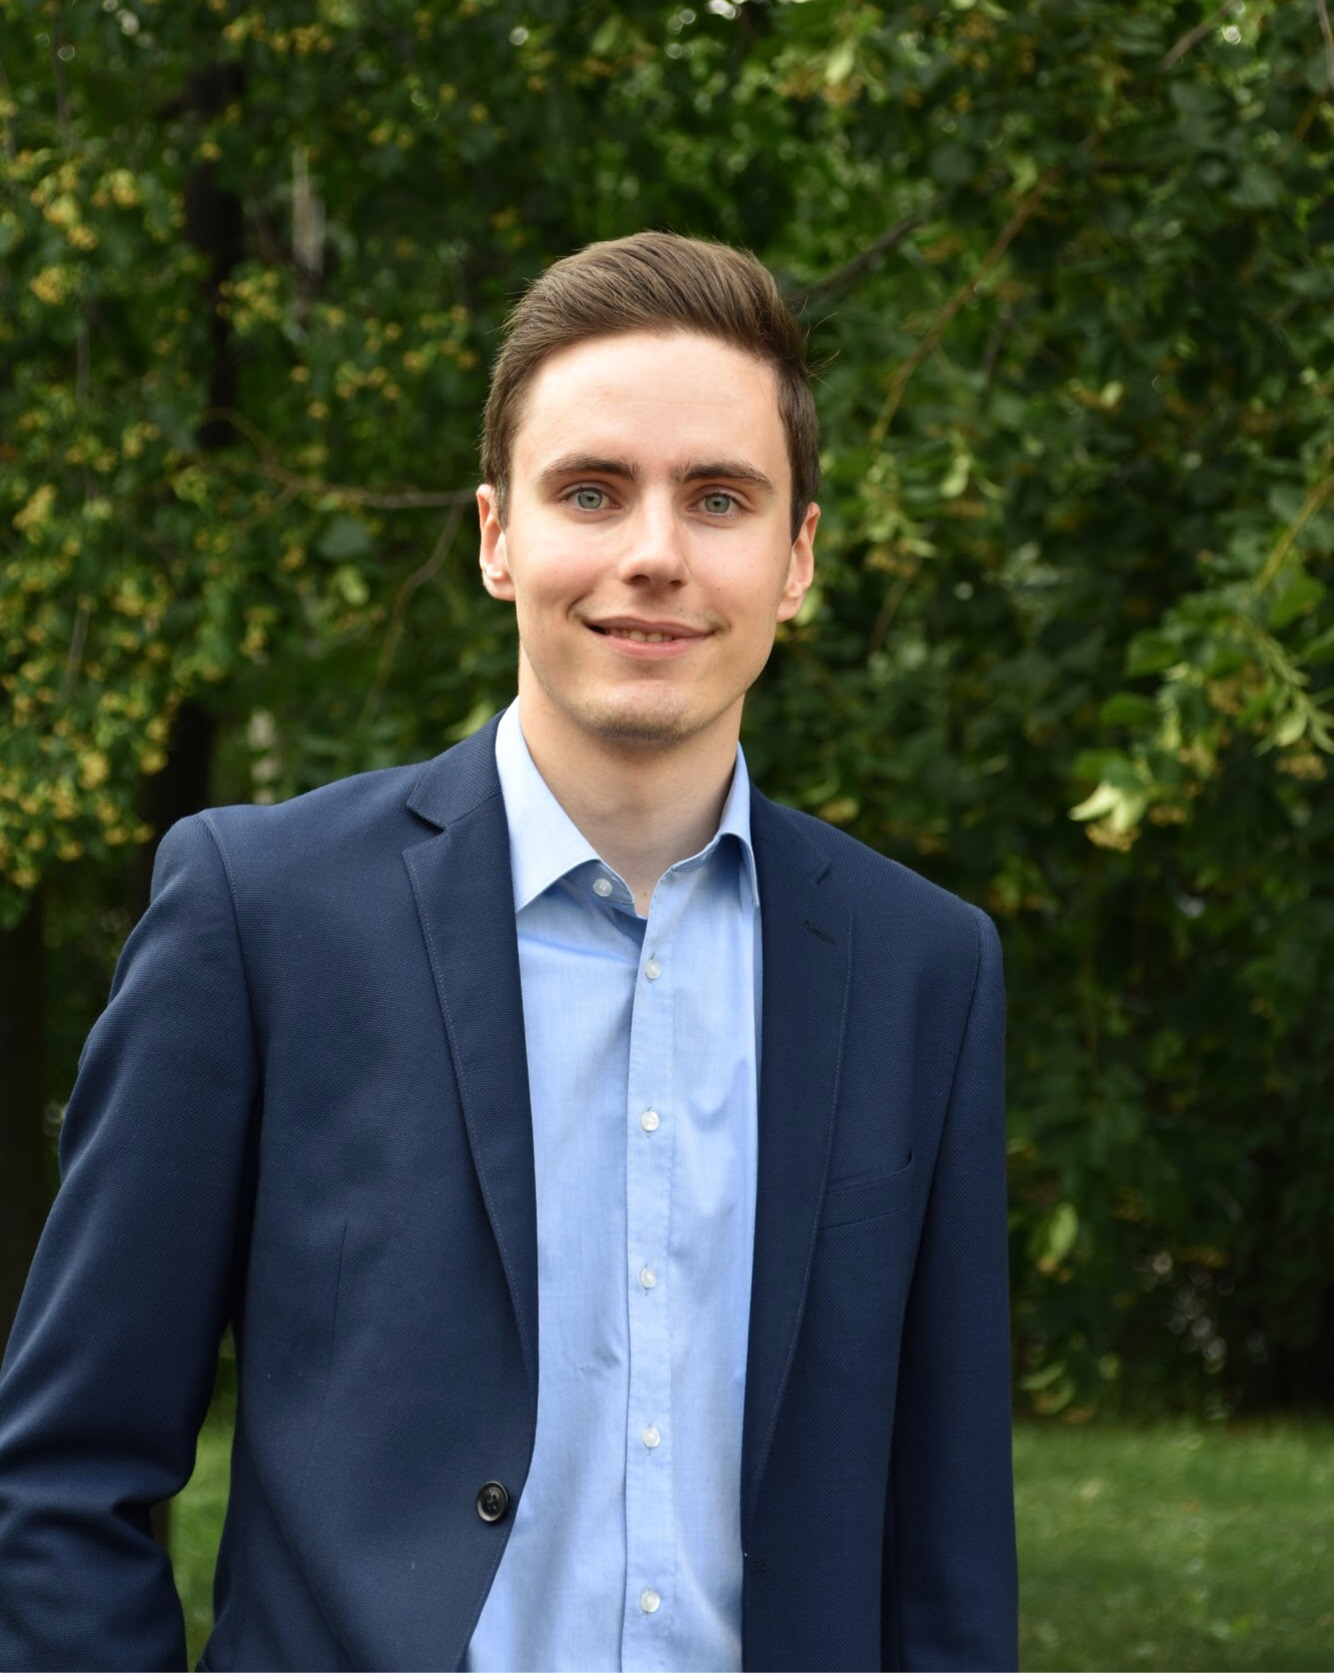 Peter Flaske